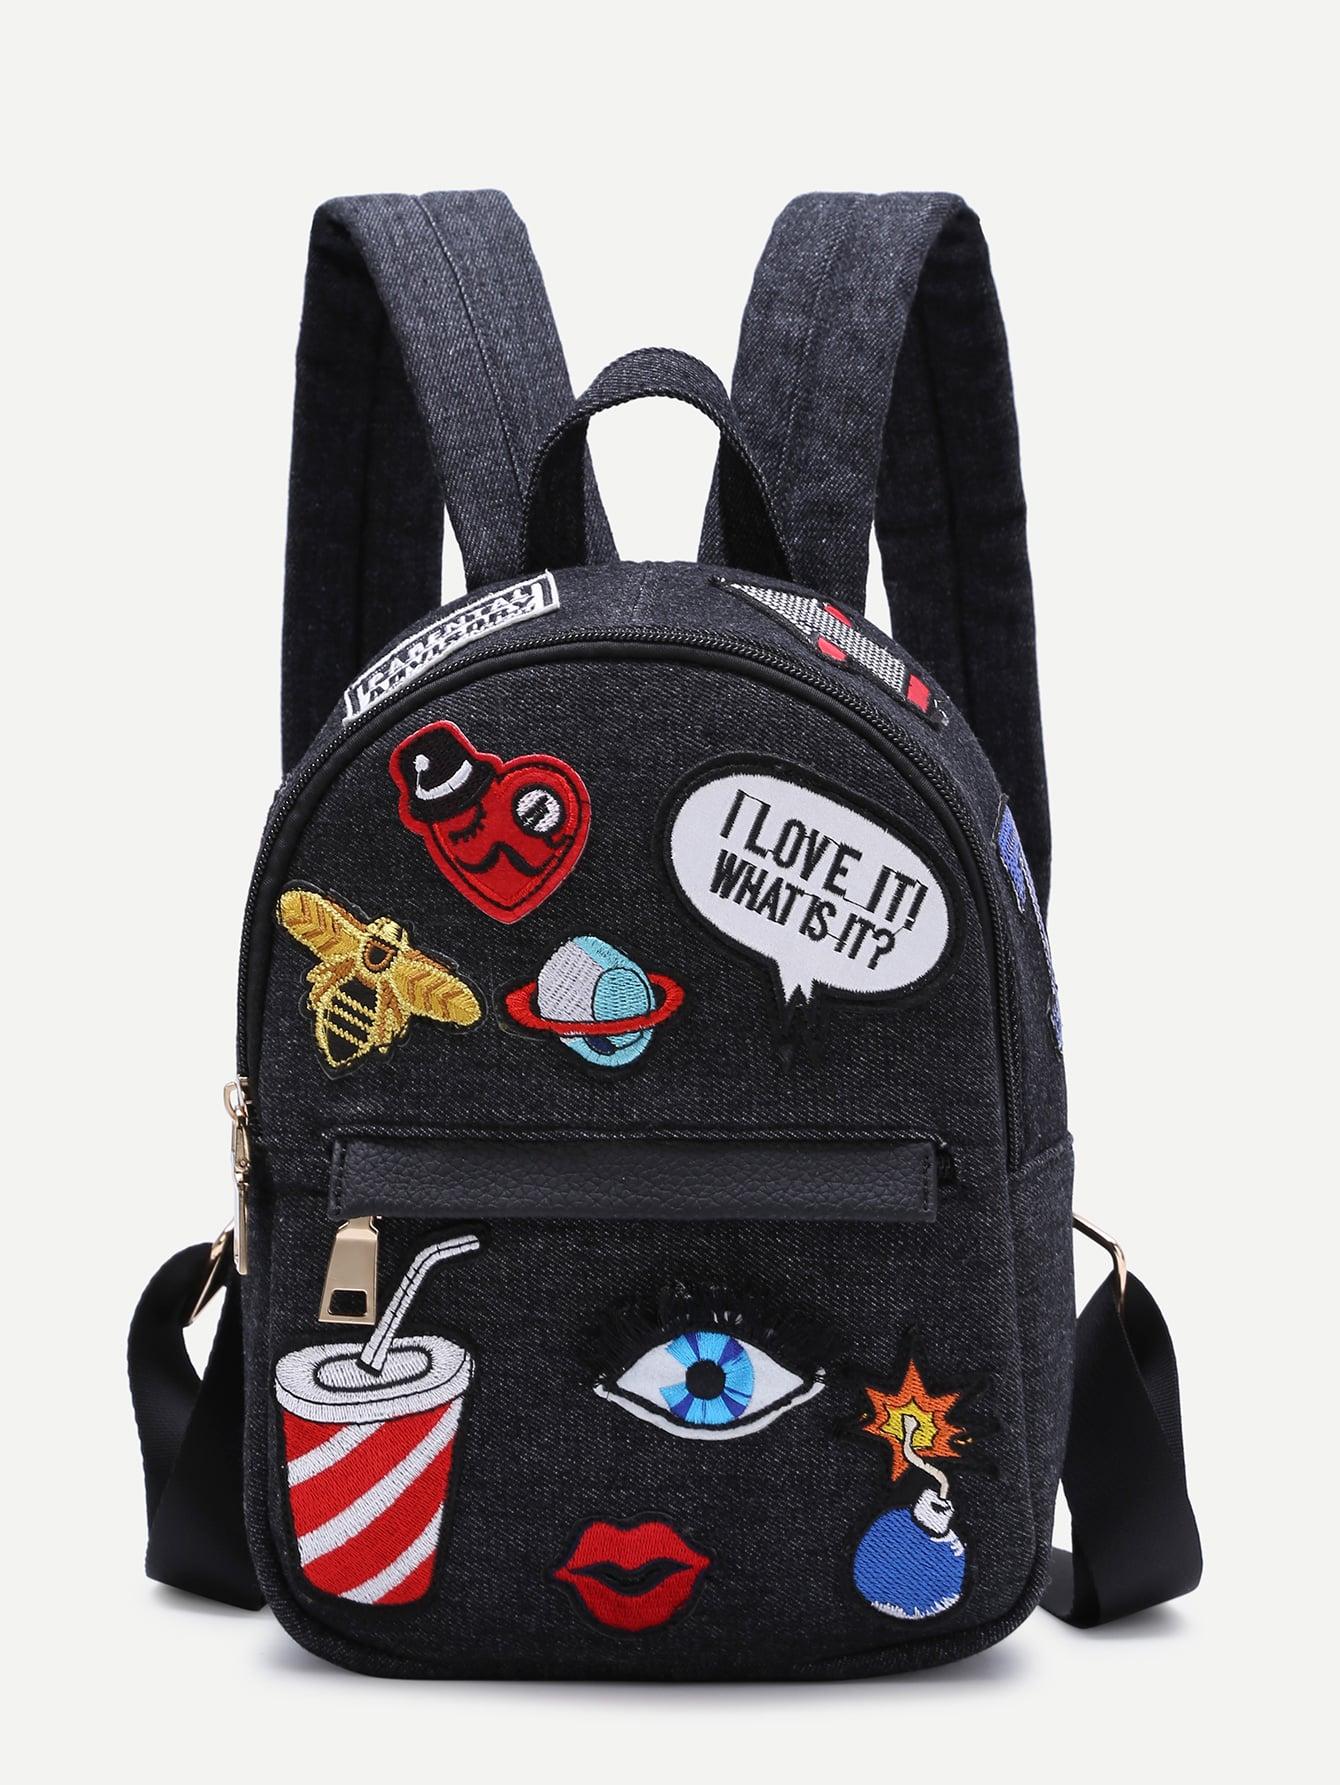 bag161230902_2